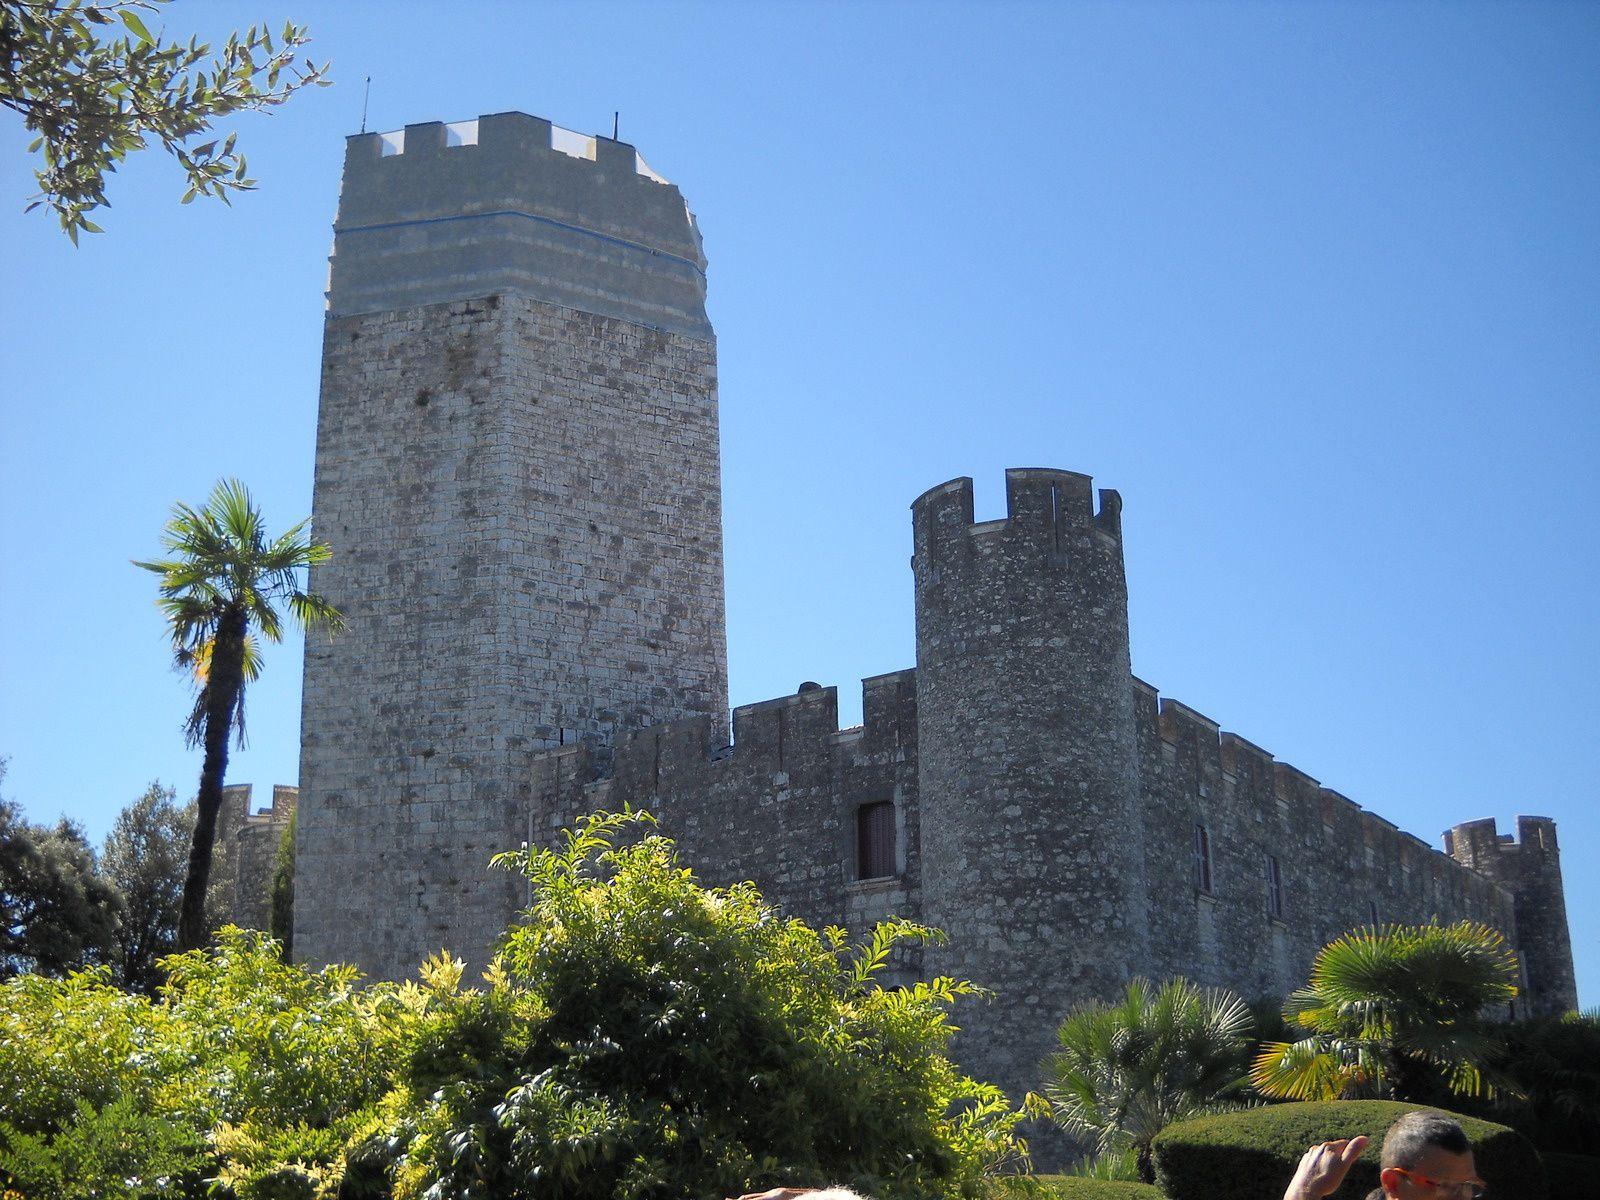 La forteresse médiévale